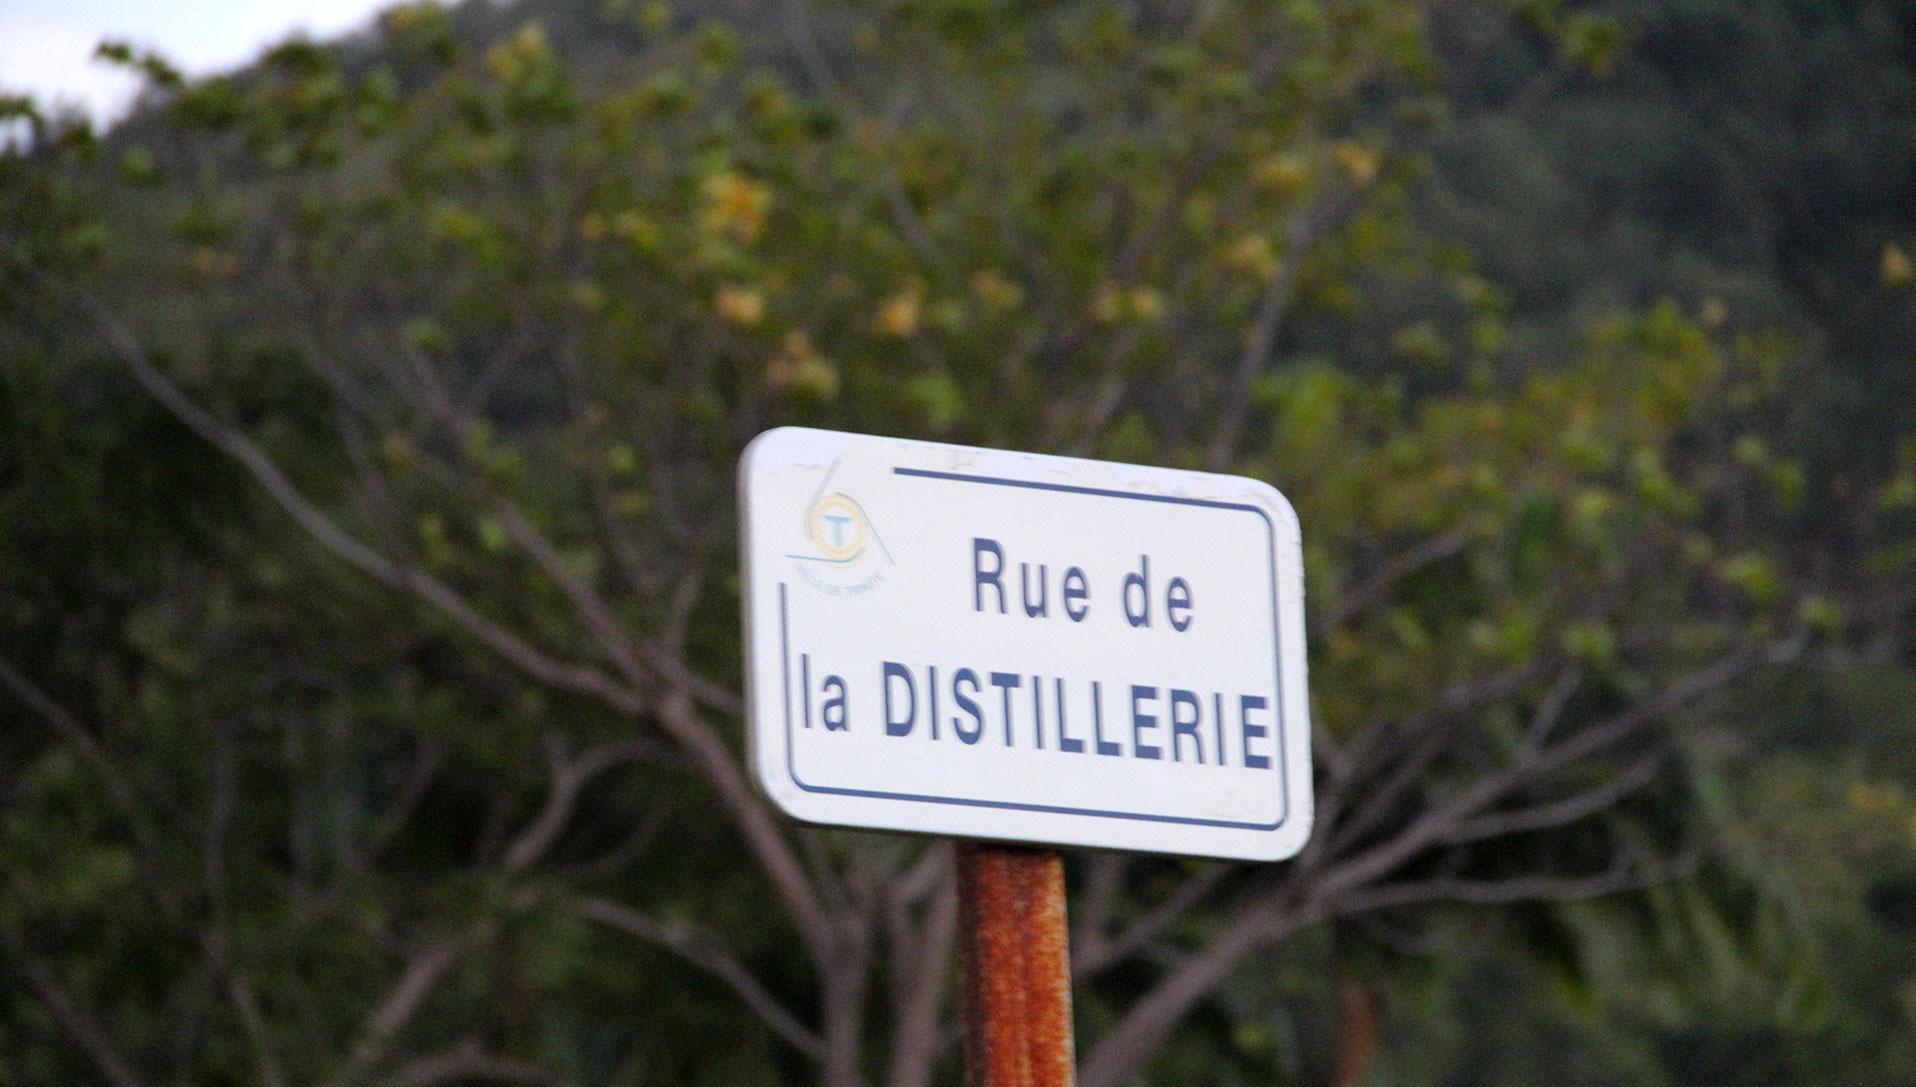 Rue-de-la-distillerie-Hardy